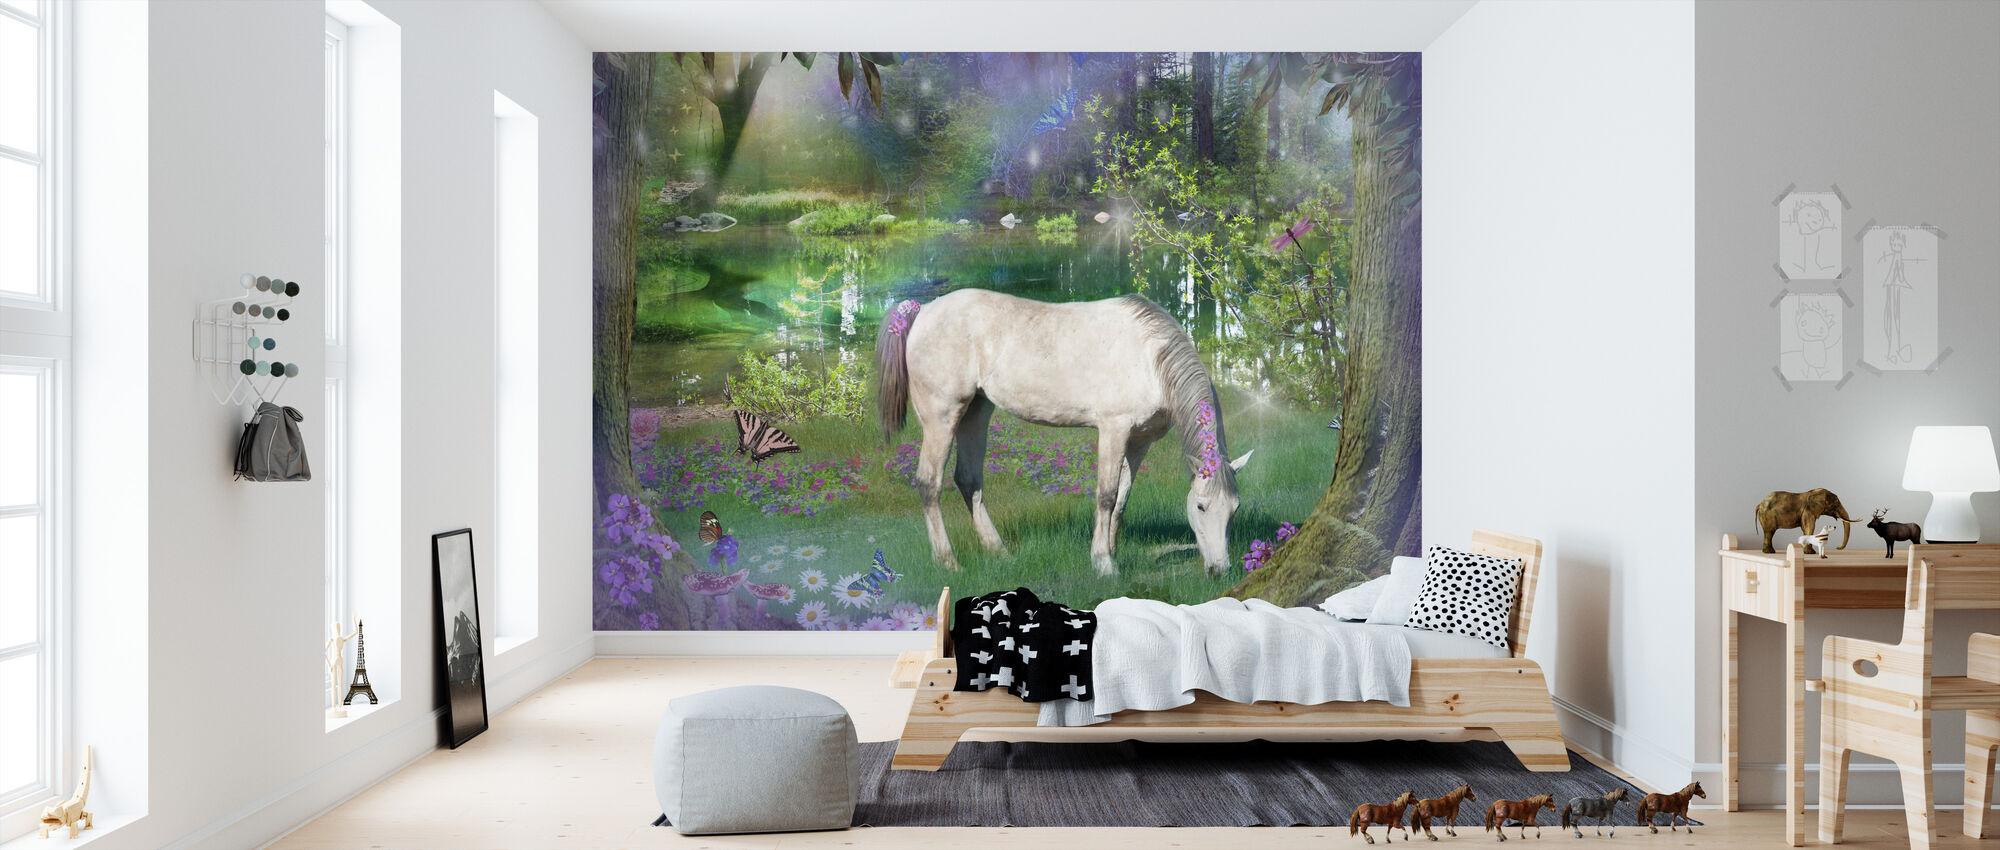 Emerald Unicorn - Tapet - Barnrum